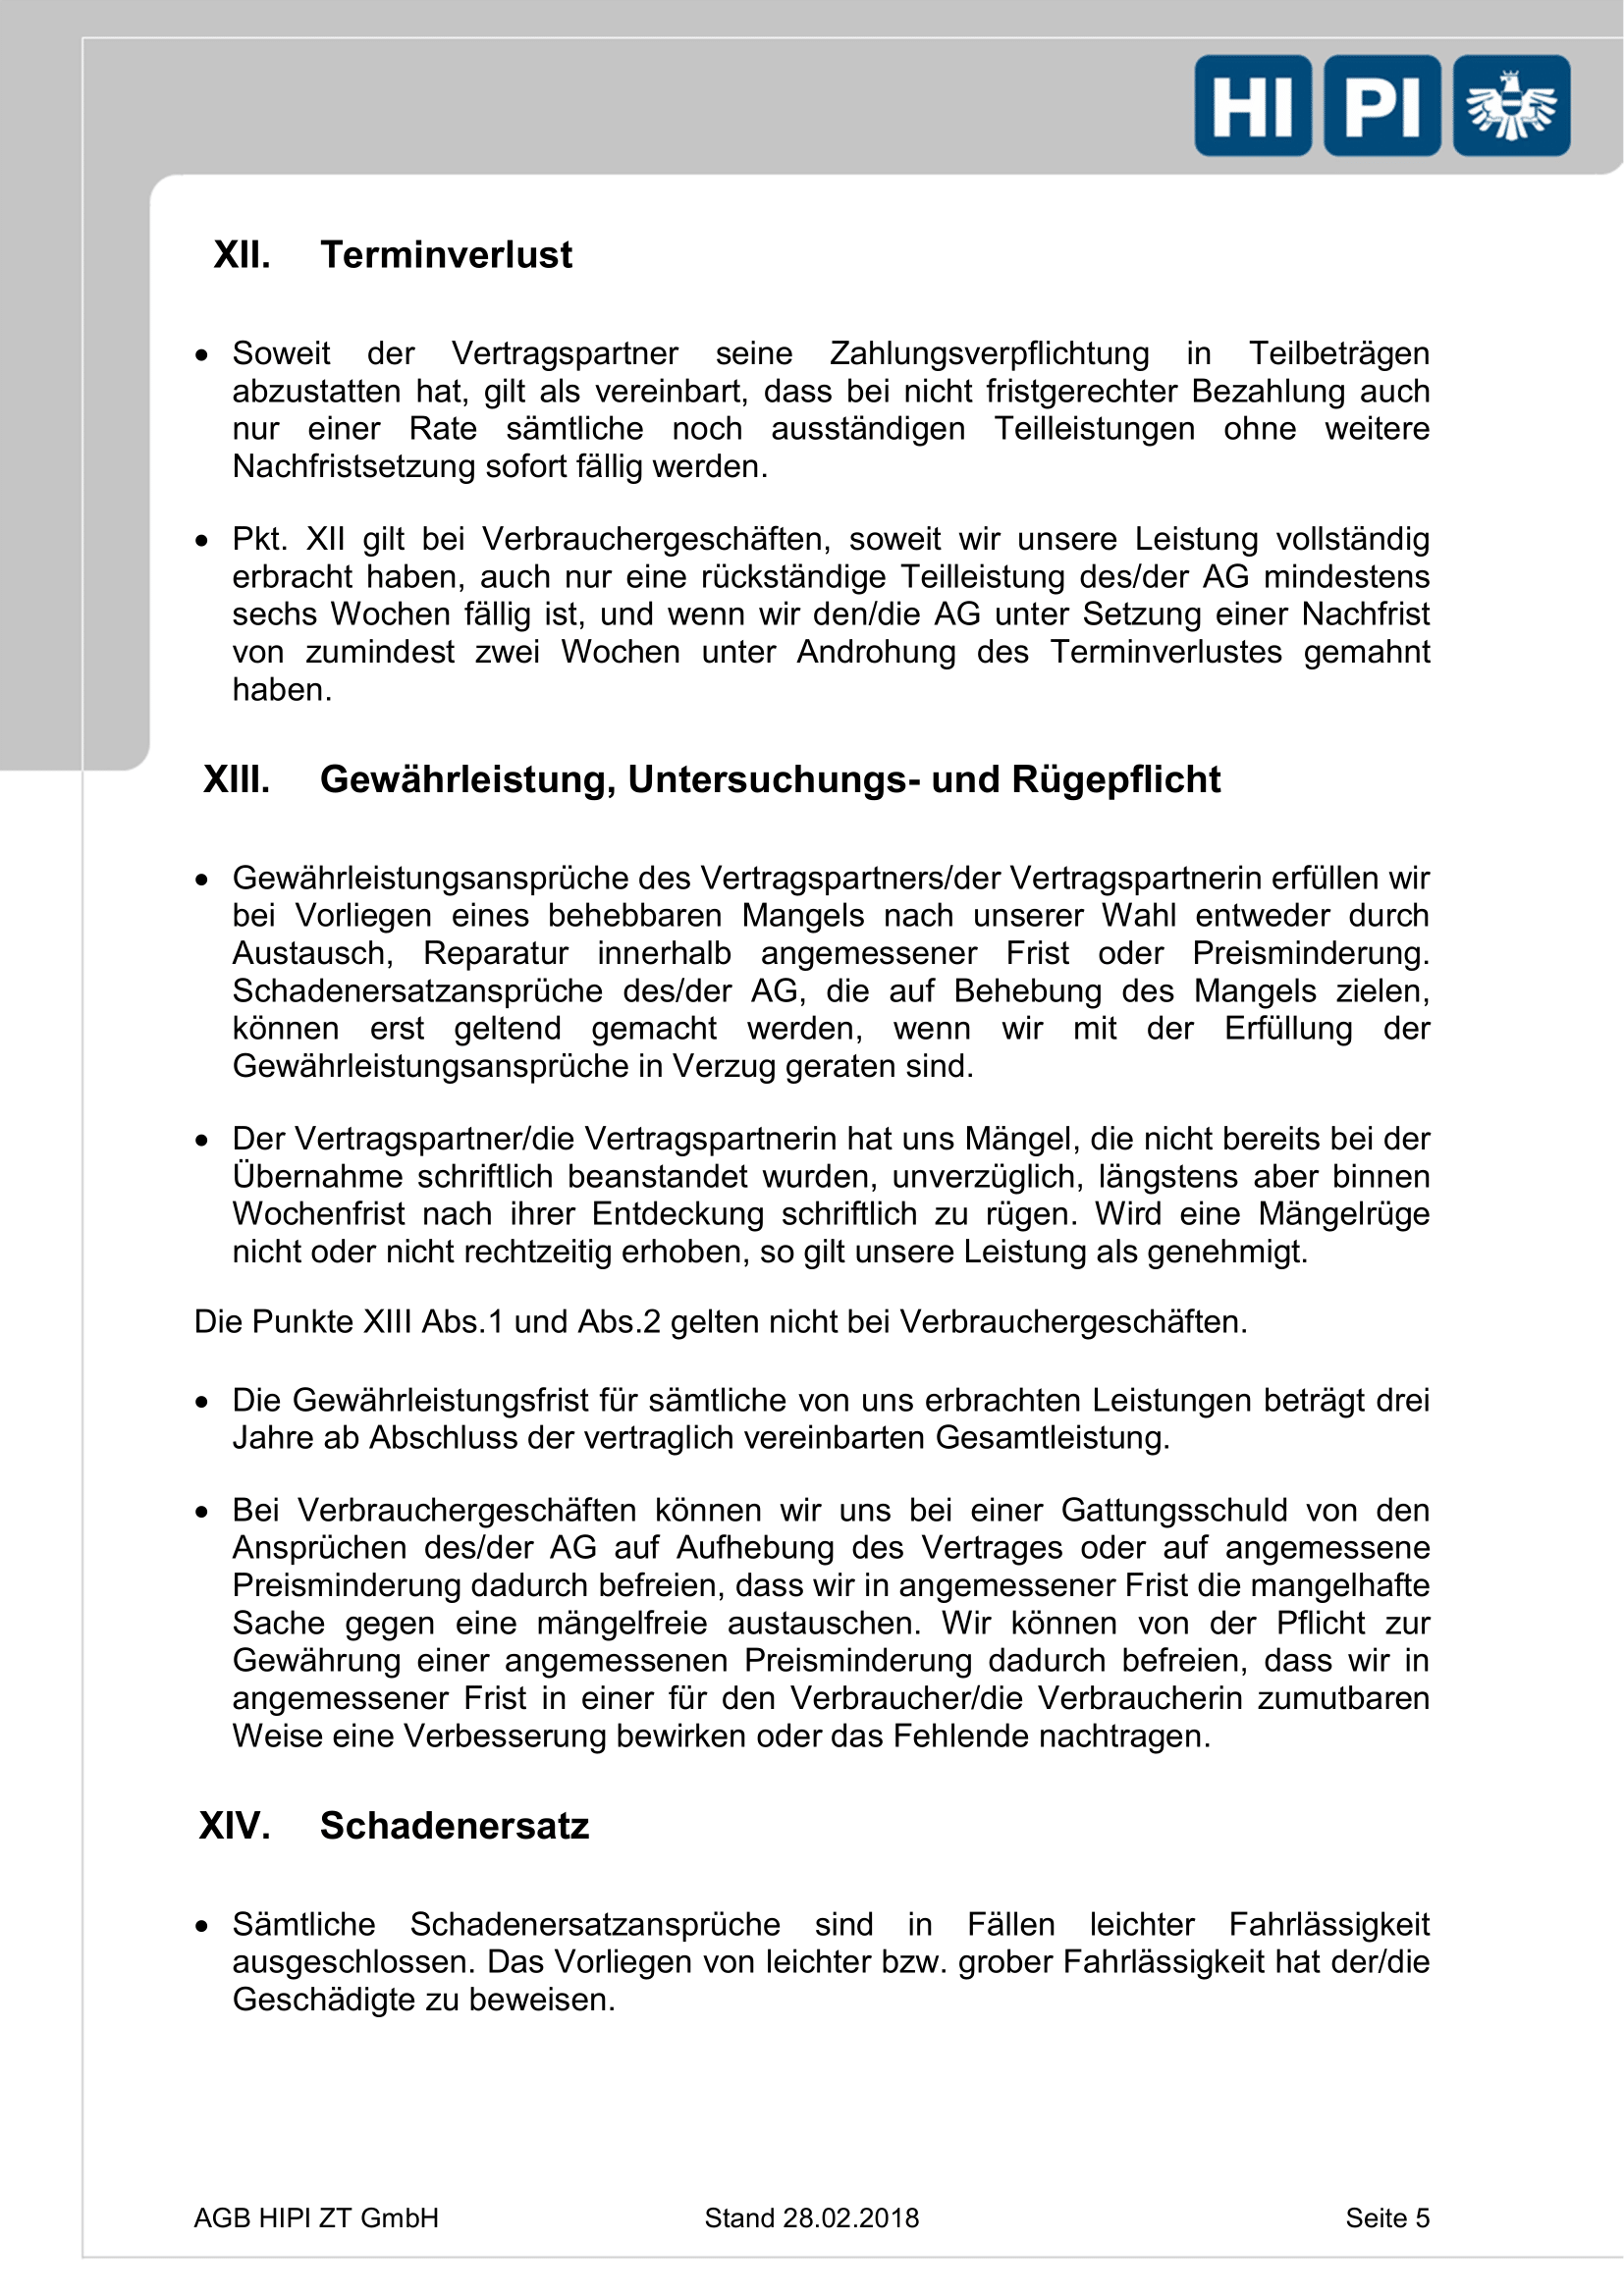 HIPI ZT GmbH AGB Seite 5